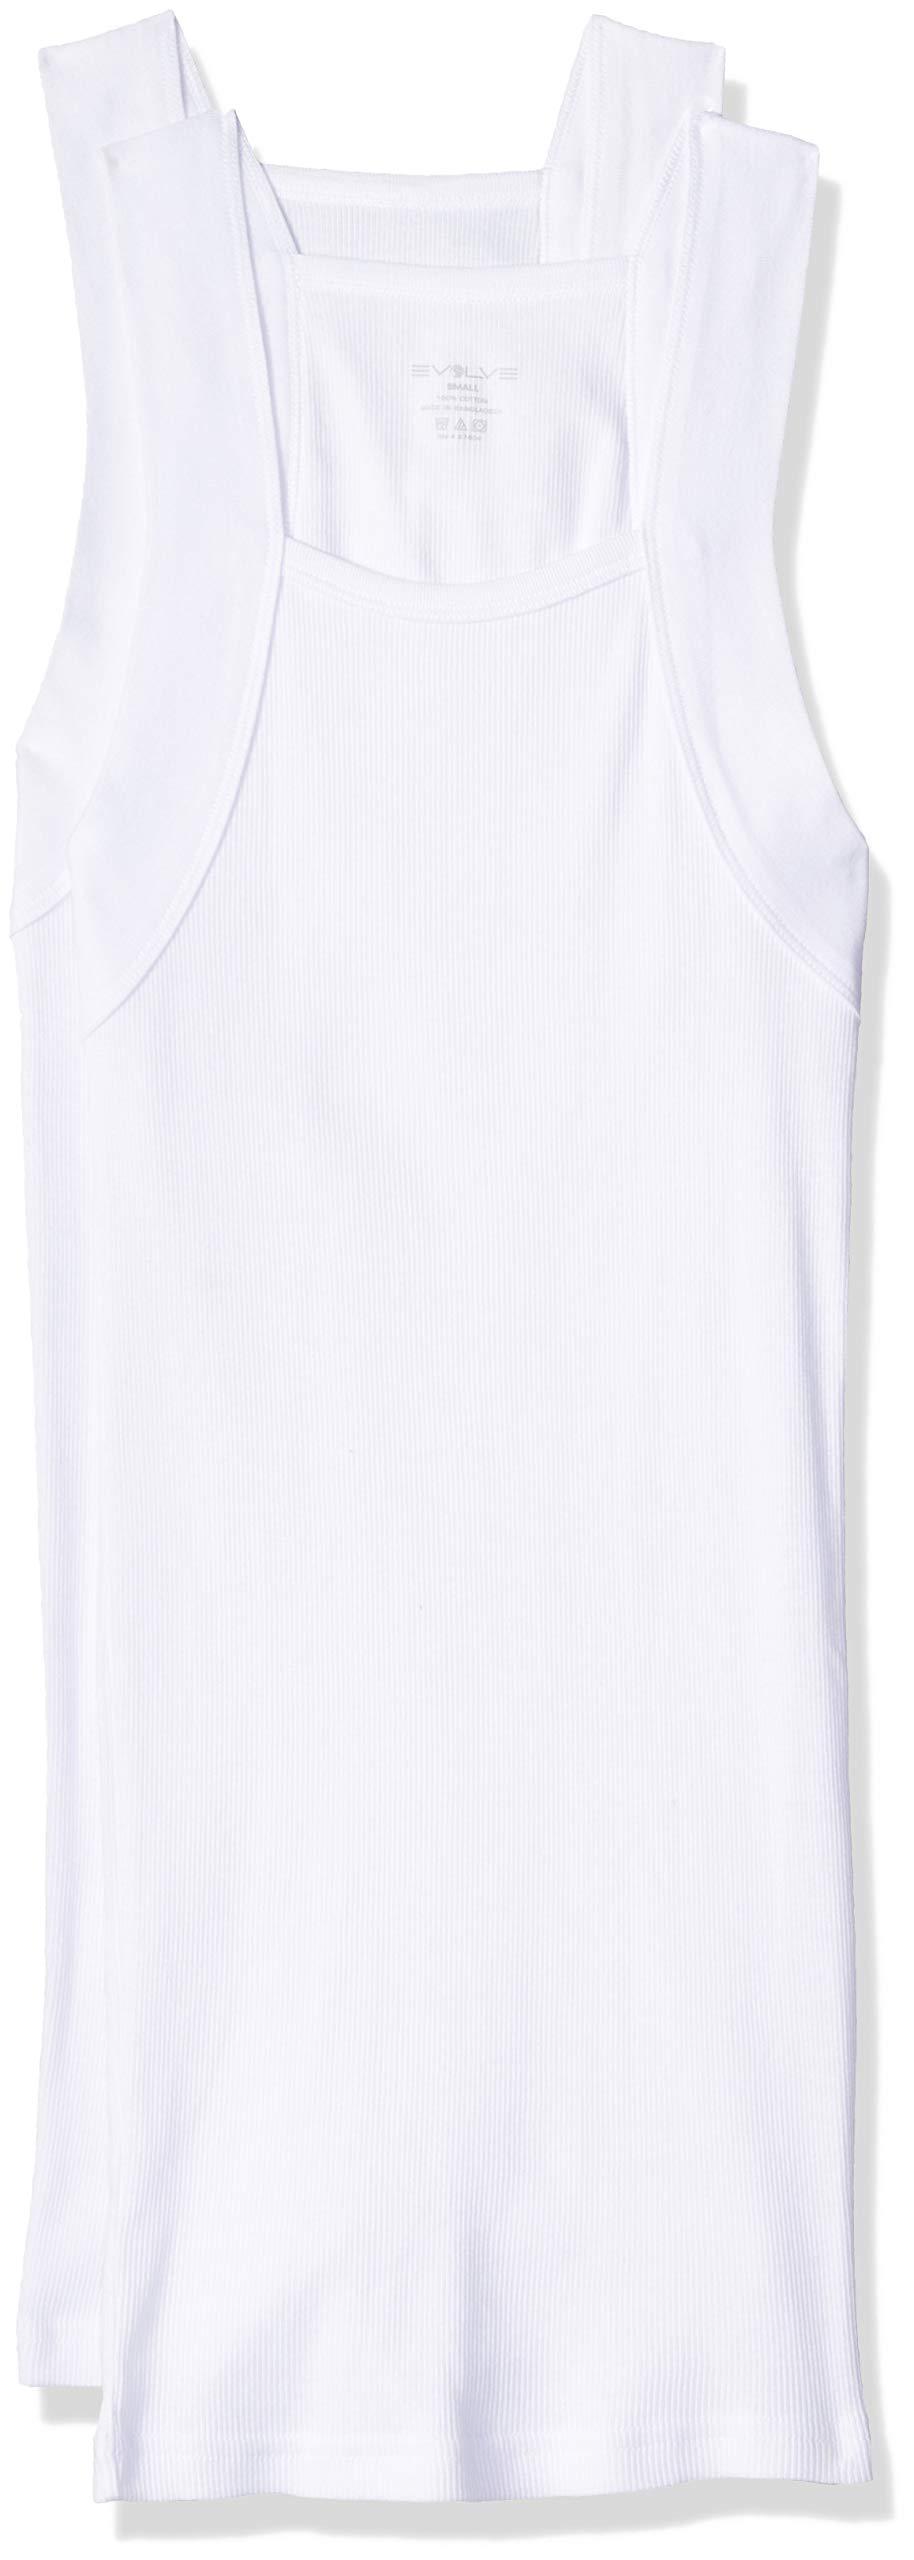 EVOLVE Men's Cotton Comfort Square Cut Tank Multi Pack, White, Medium by EVOLVE